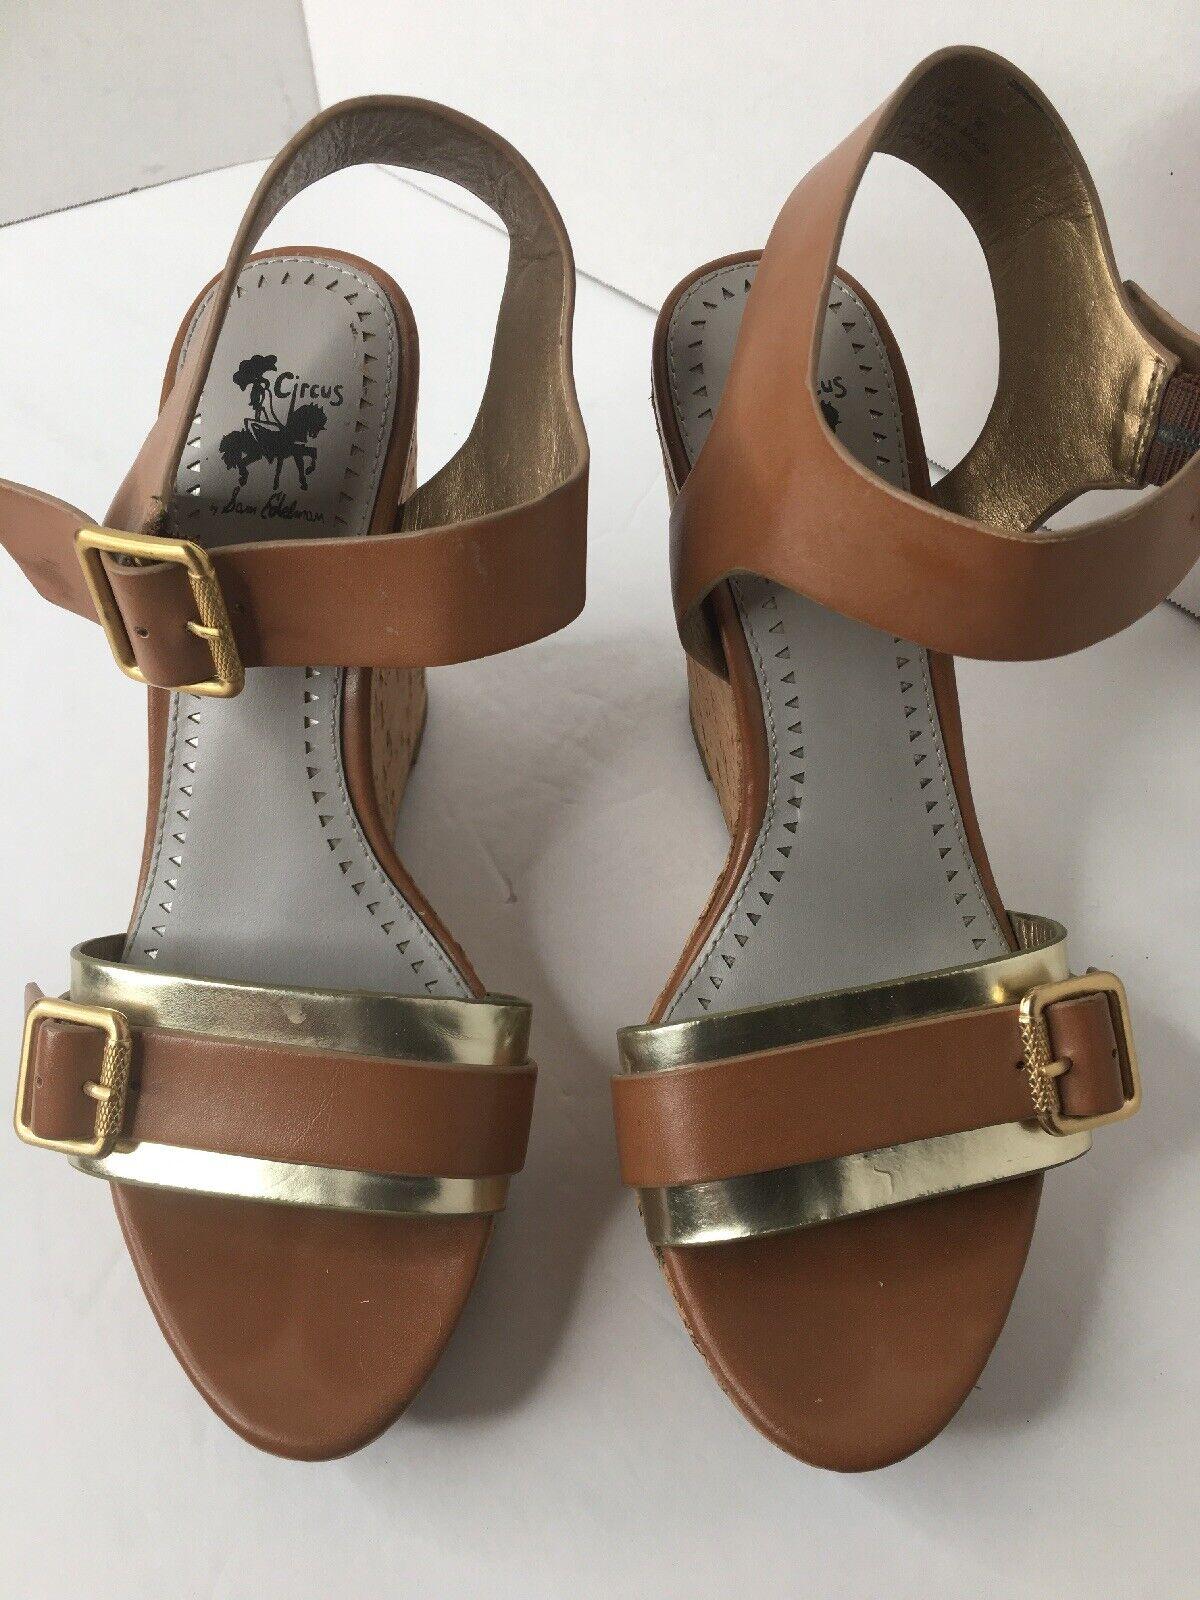 3aedd450b4574 Circus by Edelman Women's Cork Wedge Sawyer gold & Tan Sandals Size ...